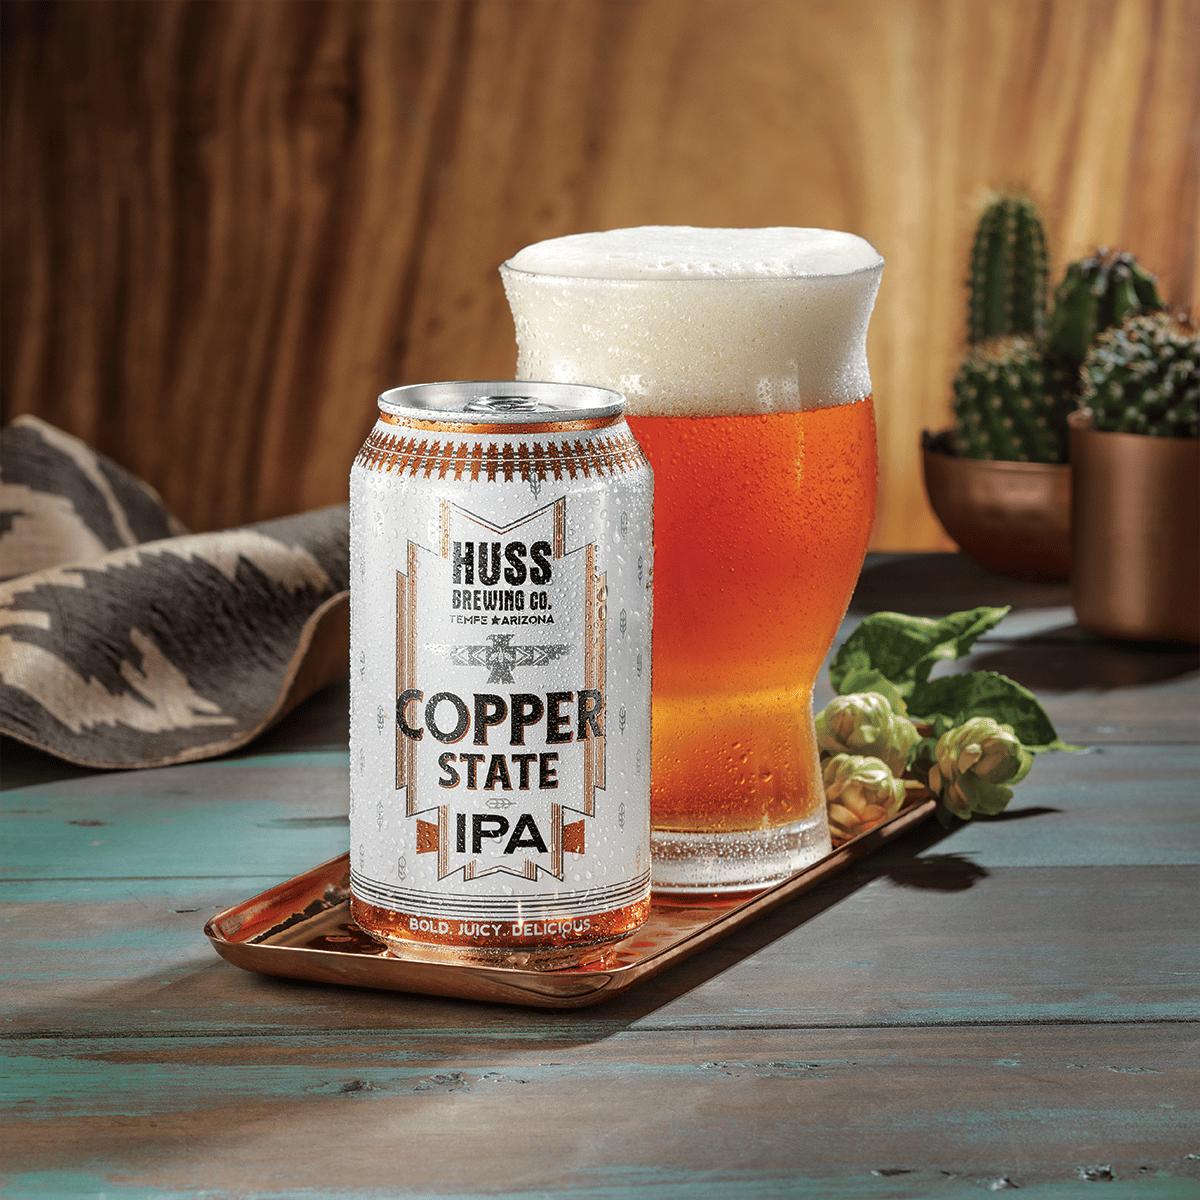 Copper State IPA